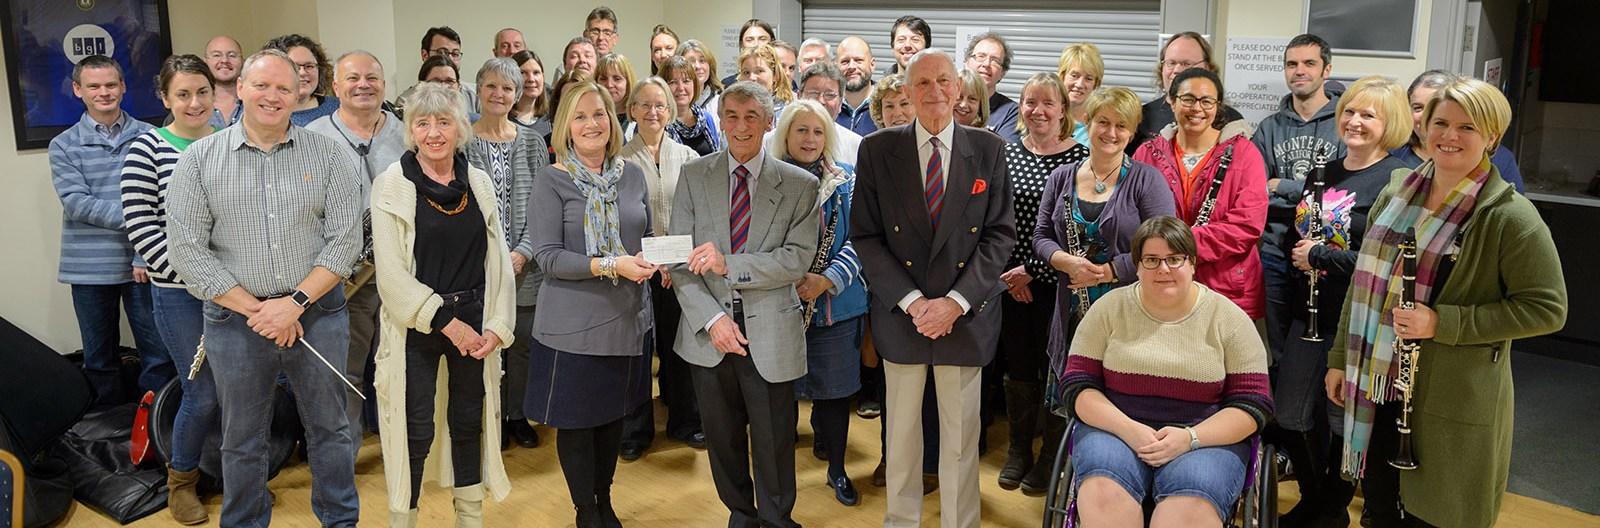 HCB Raise £5000 for SSAFA